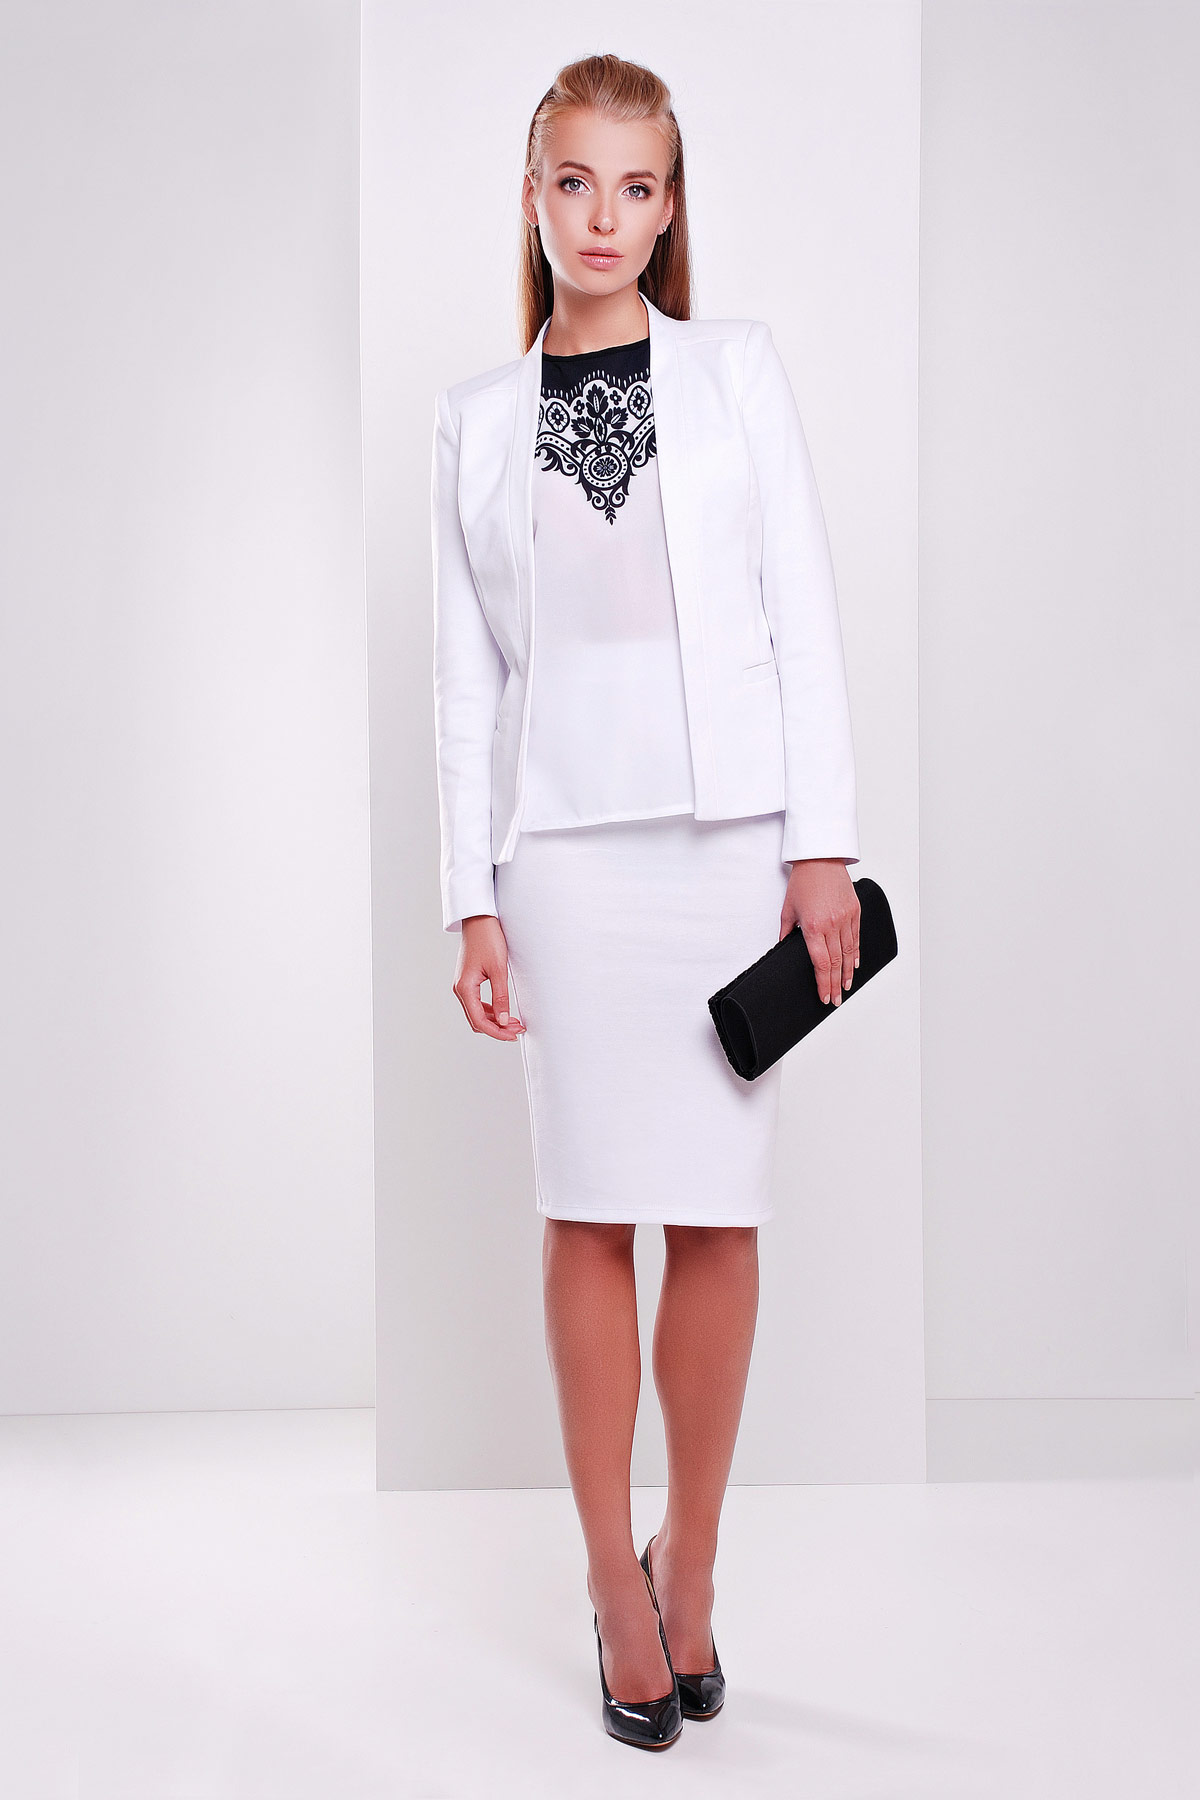 темно-синяя офисная юбка-карандаш. юбка мод. №20. Цвет: белый